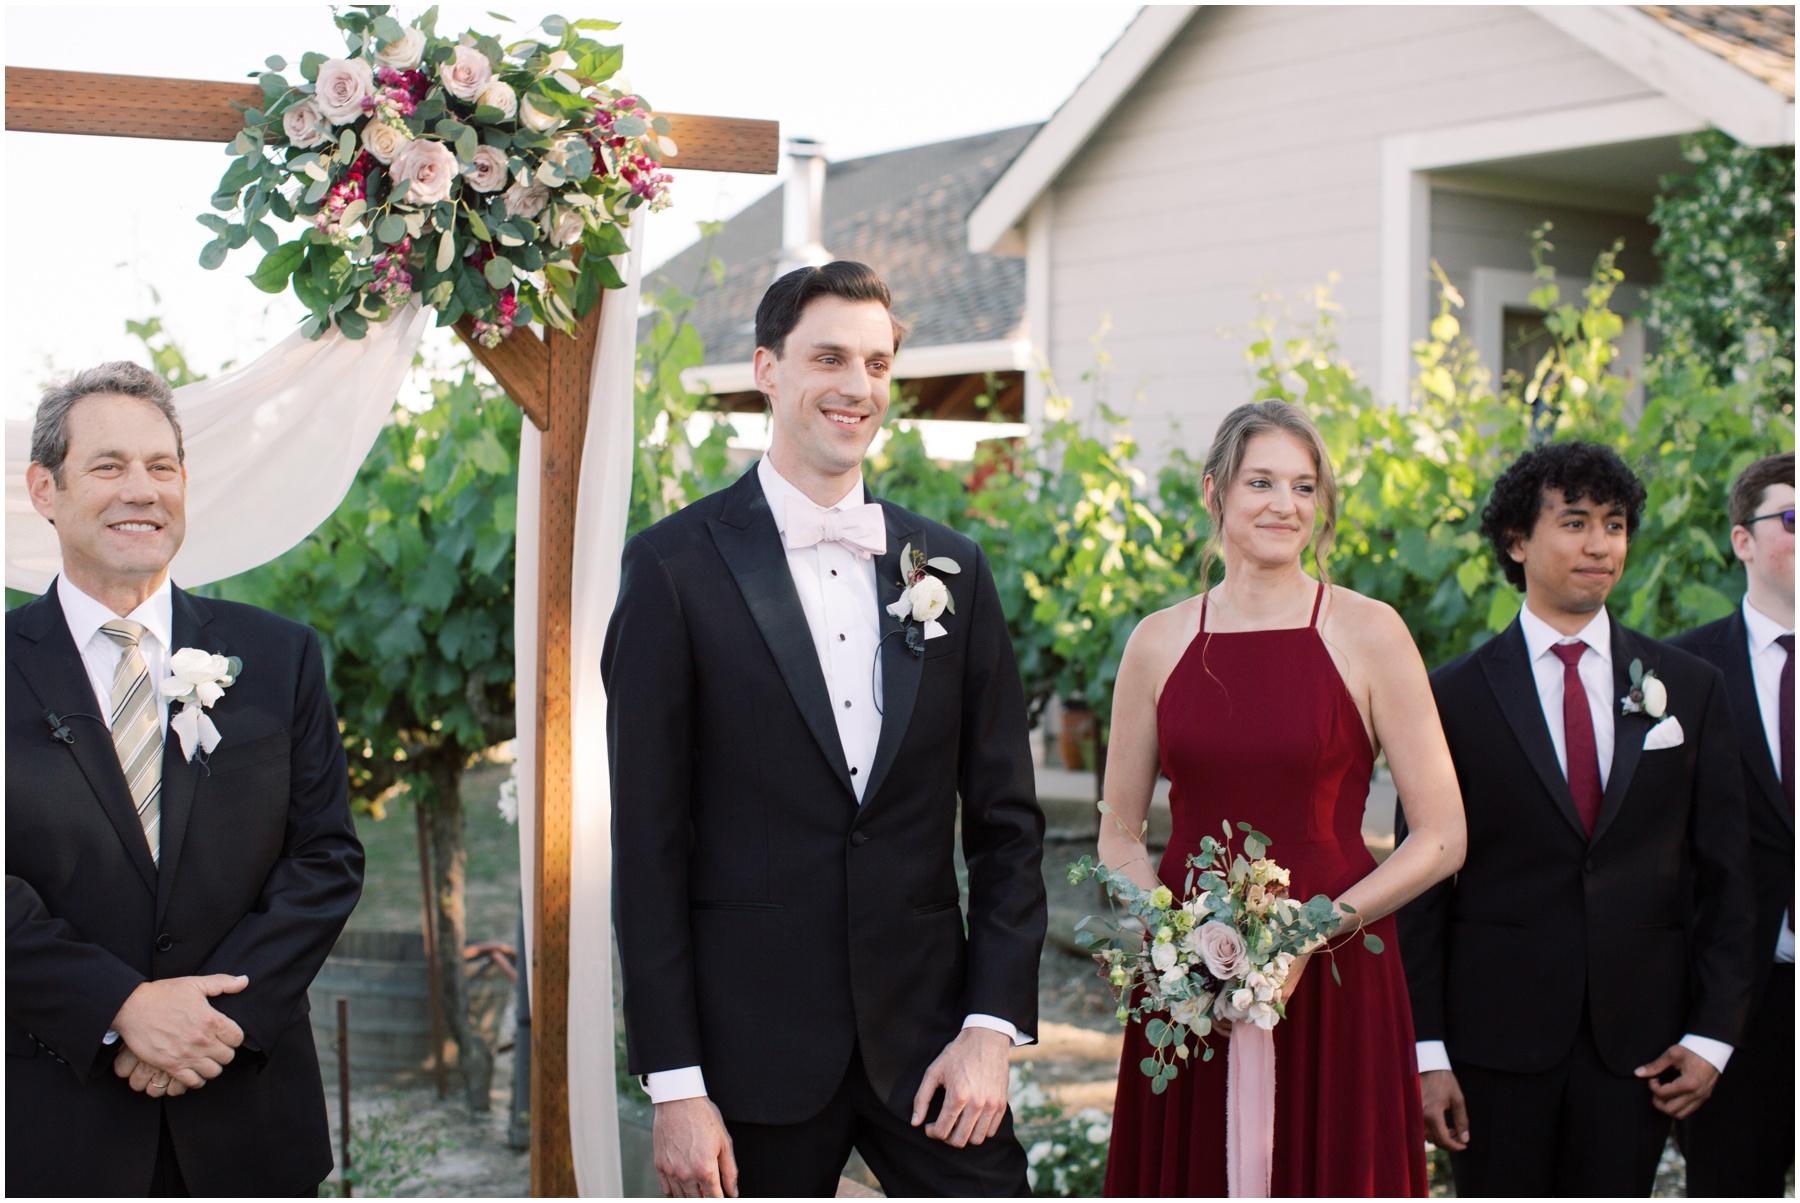 Scribner-bend-vineyards-wedding-sacramento-california-Kristine-Herman-Photography-152.jpg